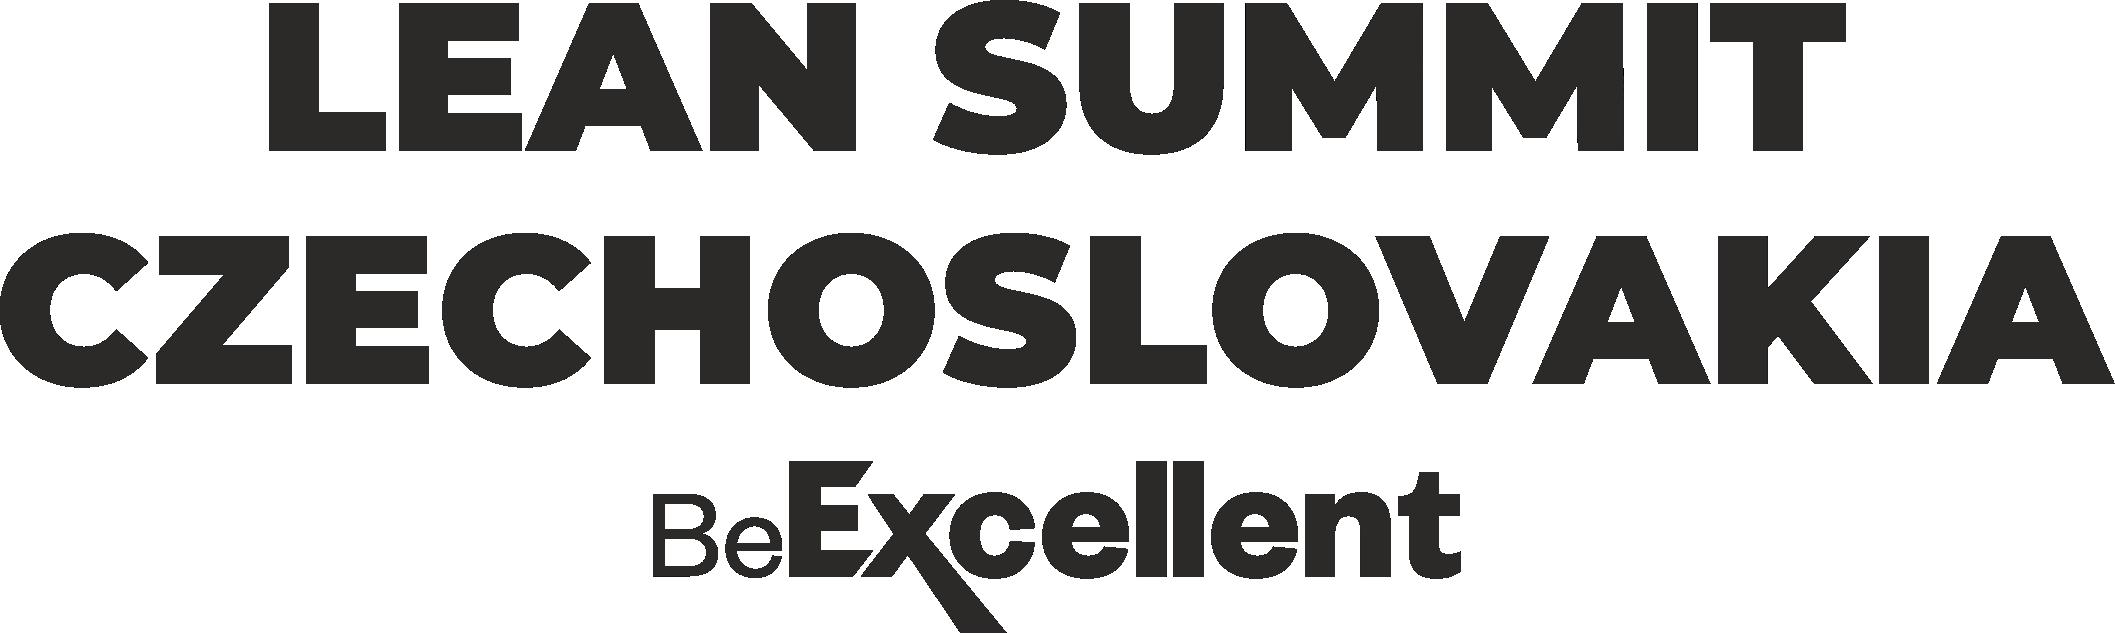 BeExcellent Lean Summit CzechoSlovakia